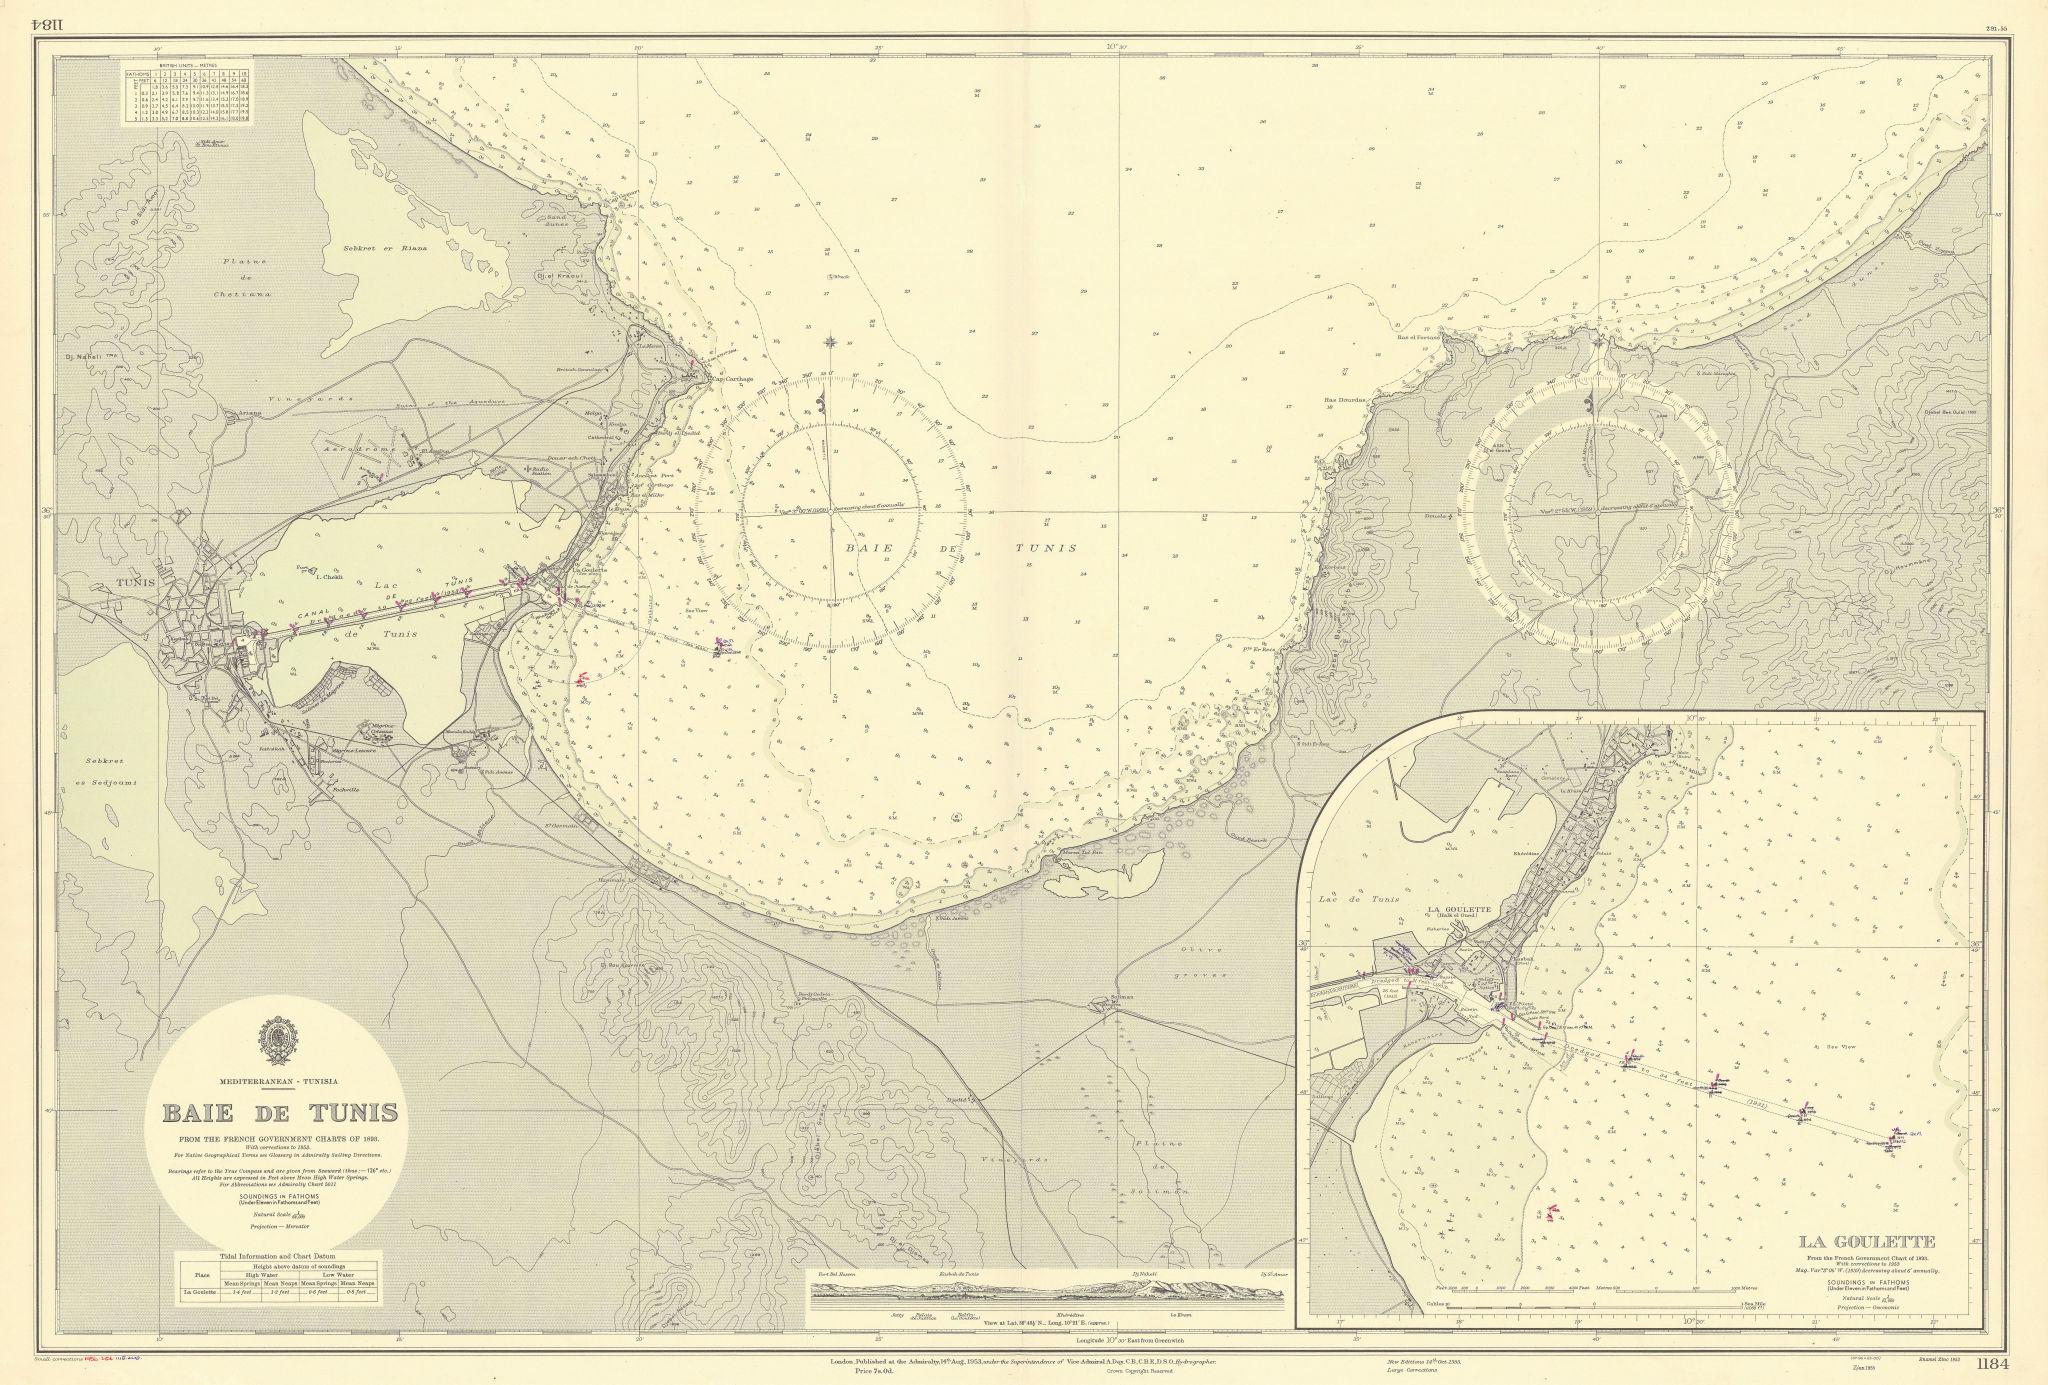 Baie de Tunis, Tunisia, Mediterranean. ADMIRALTY sea chart 1953 (1956) old map